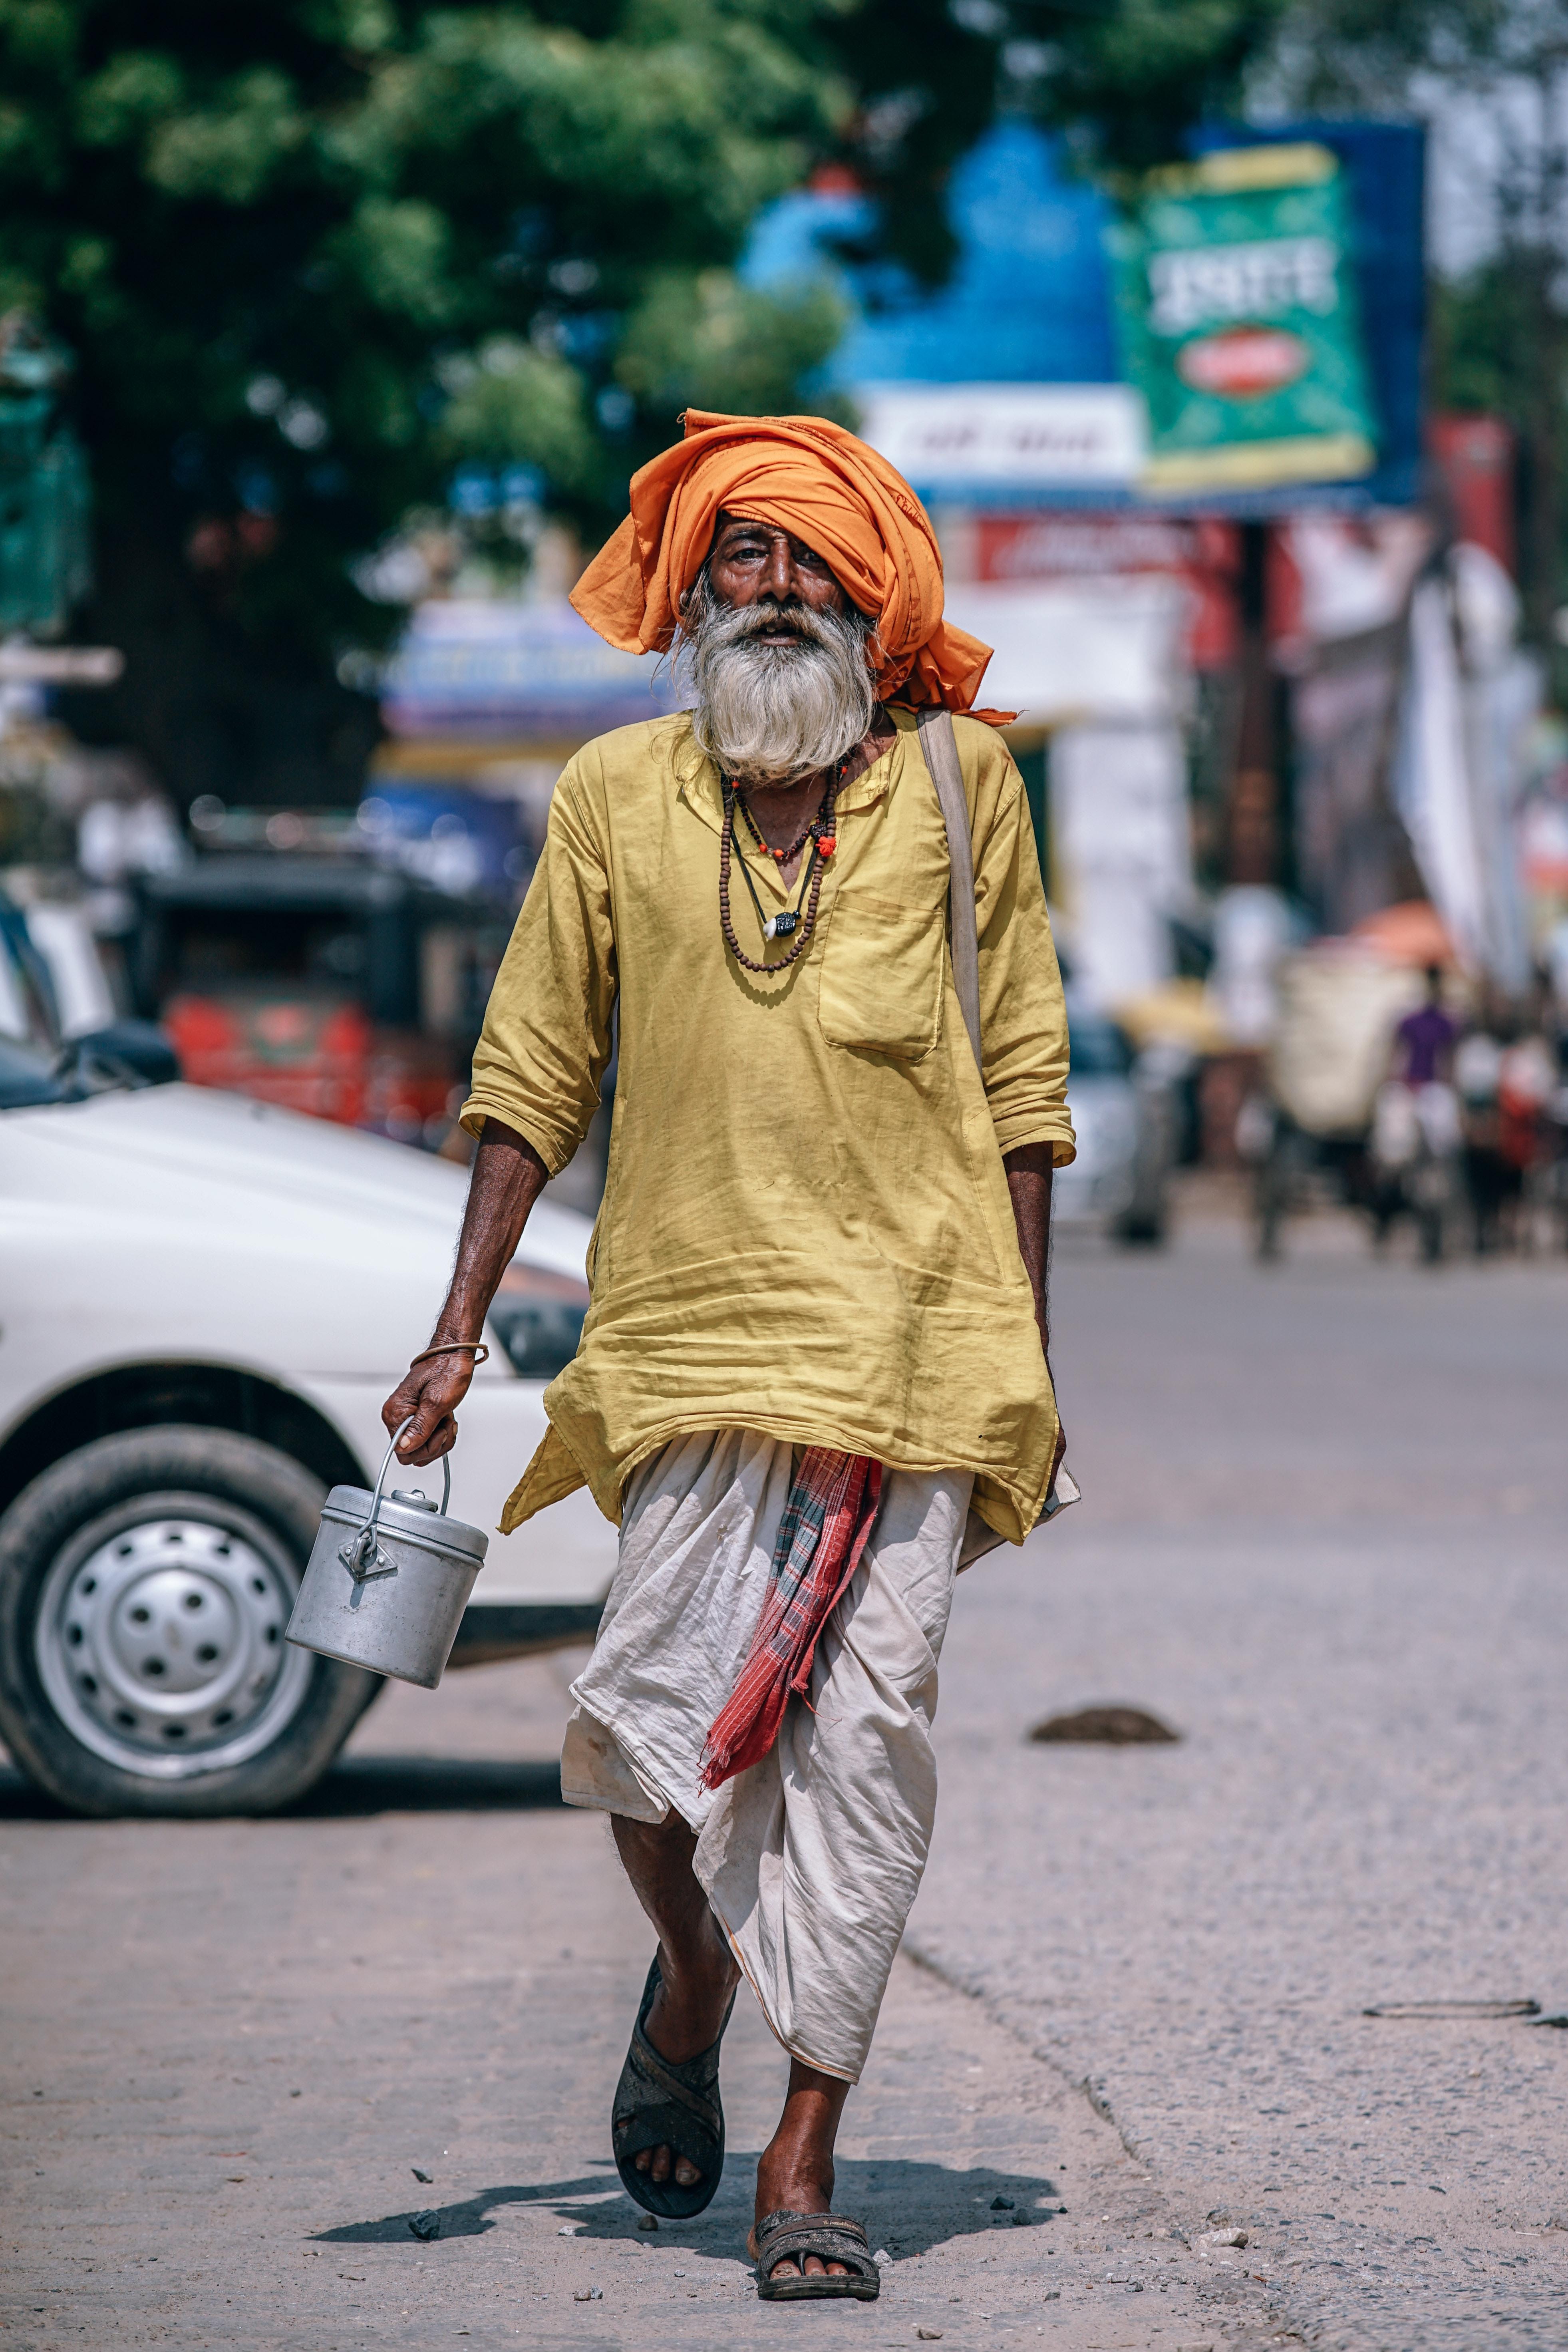 Man walking on street carrying metal bucket photo